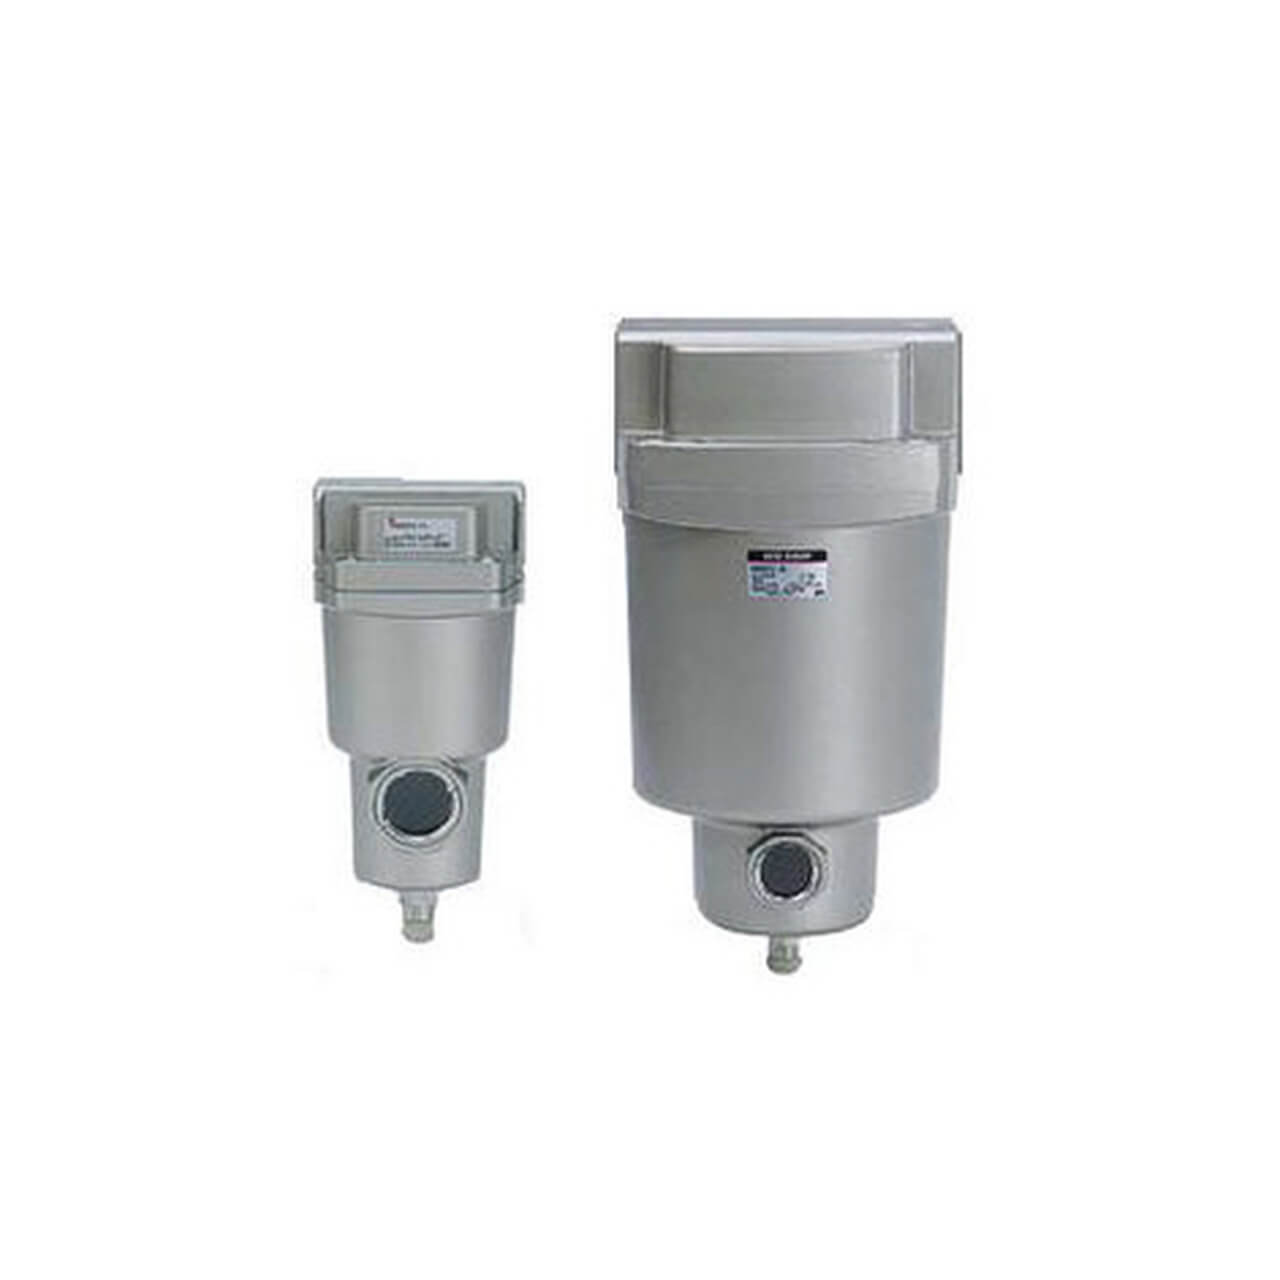 SMC AMG350C-N04BC Water Separator